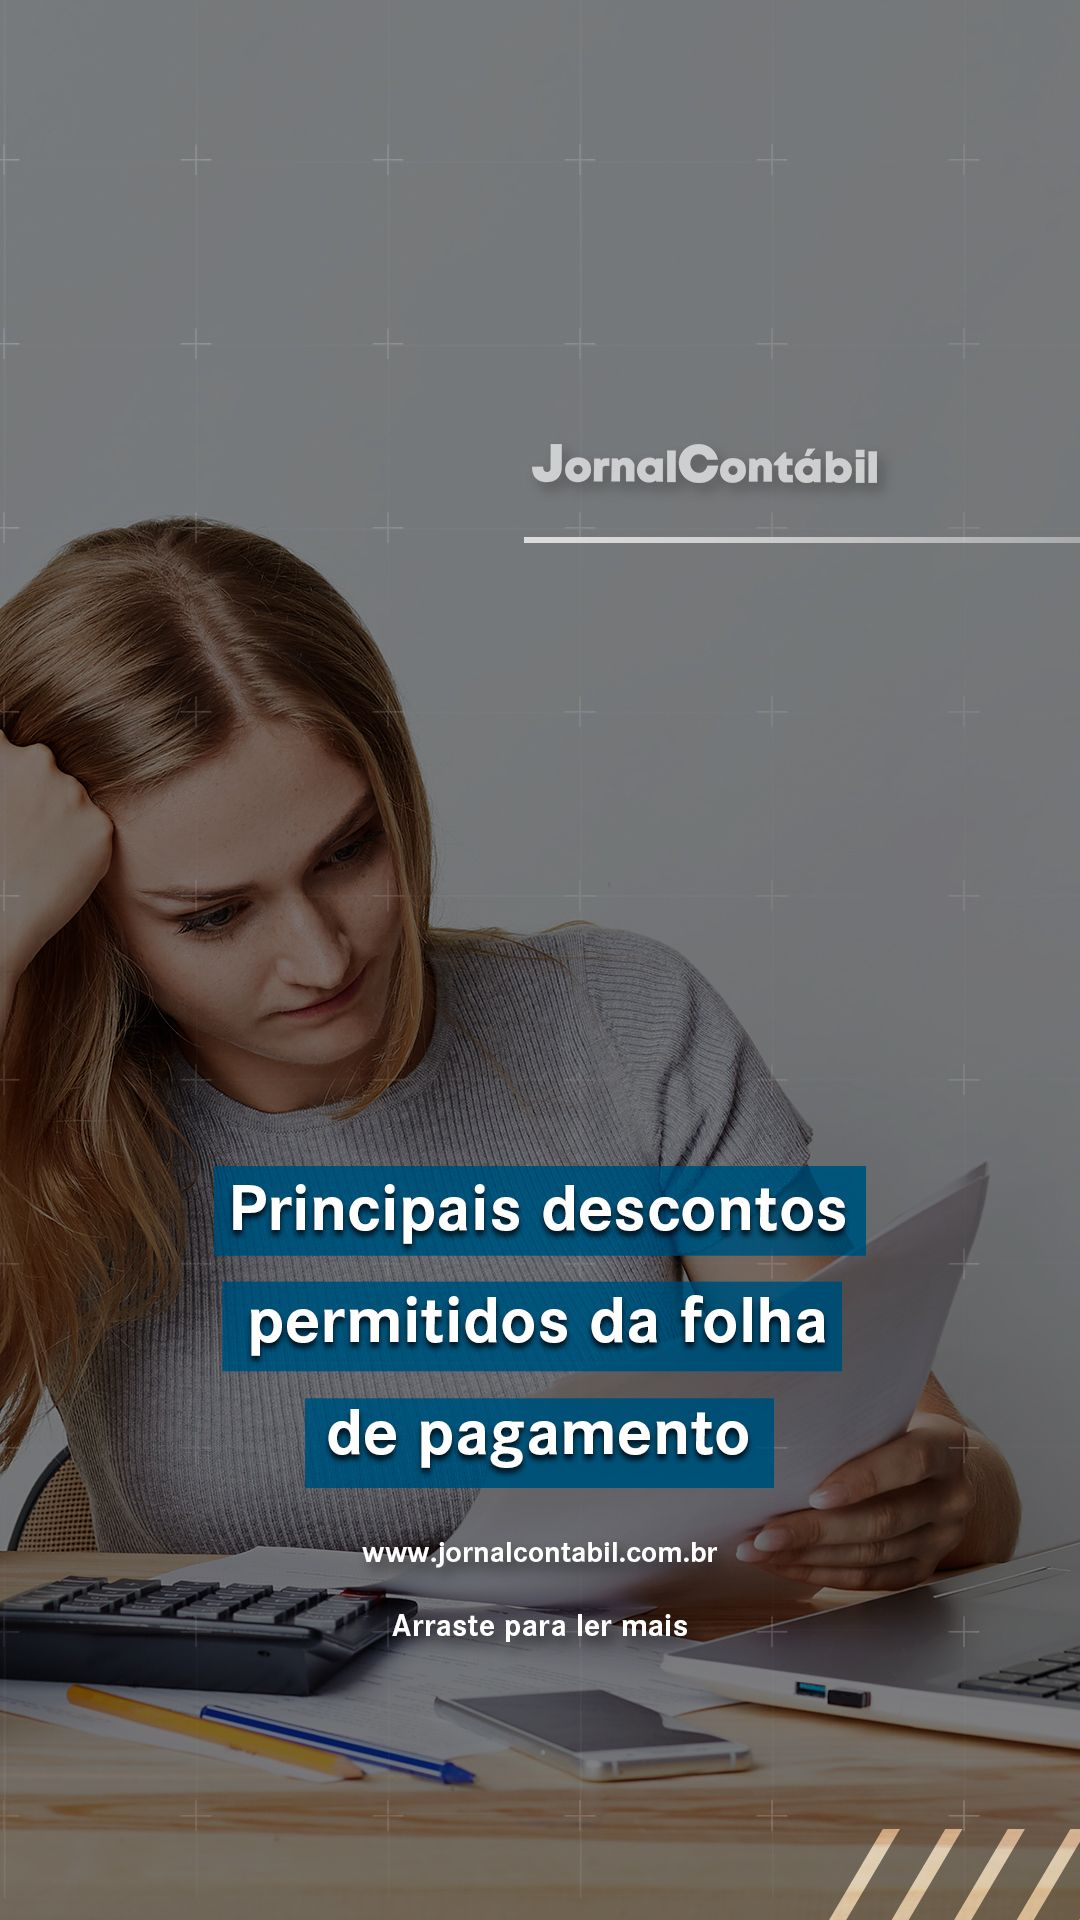 Pin de Jornal Contábil em Jornal Contabil em 2020